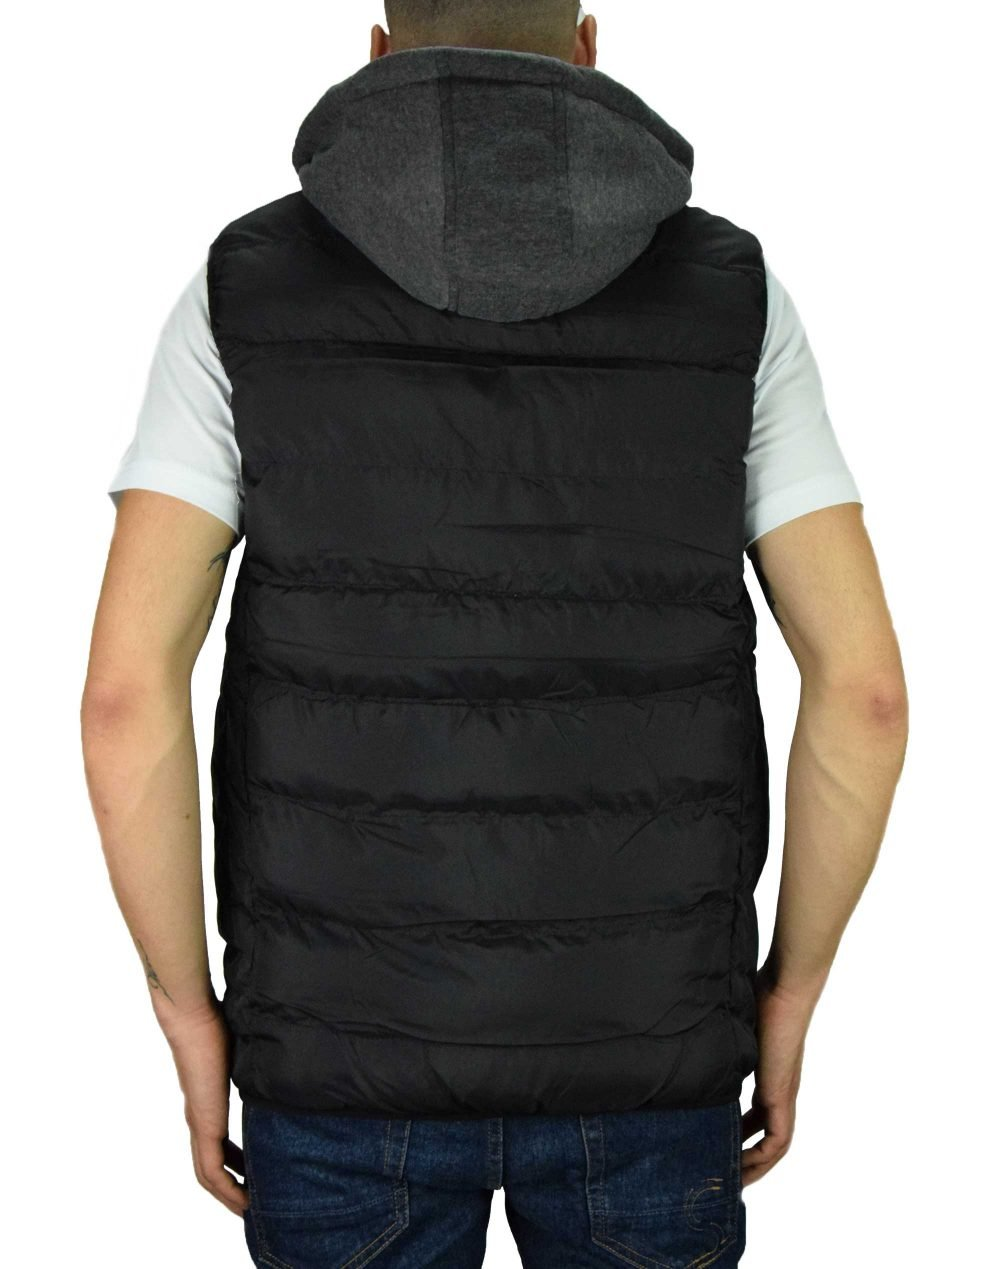 Biston Mens Hooded Puffy Vest (42-202-001) Black